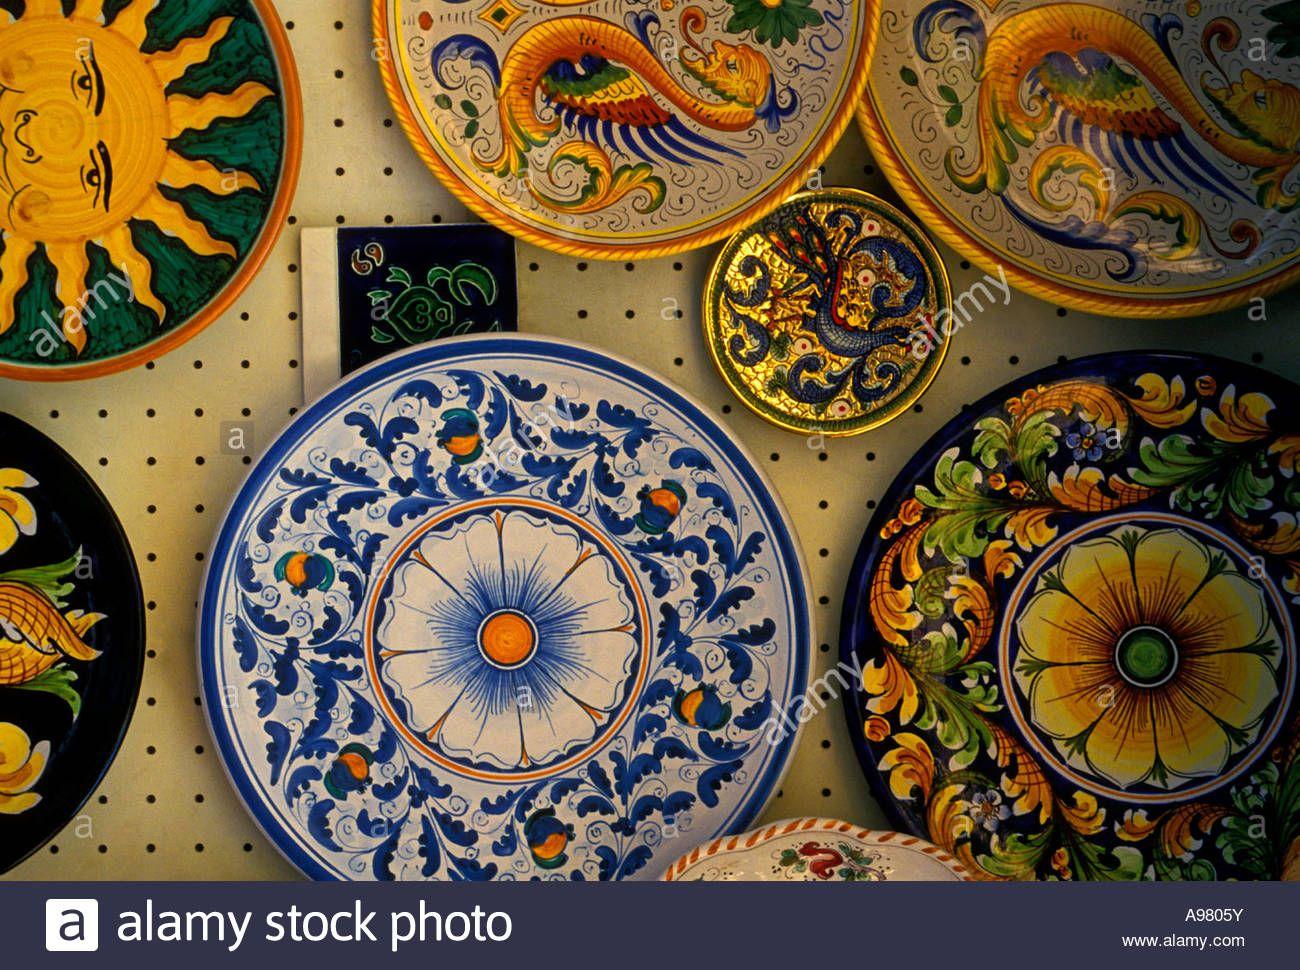 ceramic-plates-taormina-messina-province-sicily-italy-europe- & ceramic-plates-taormina-messina-province-sicily-italy-europe-A9805Y ...